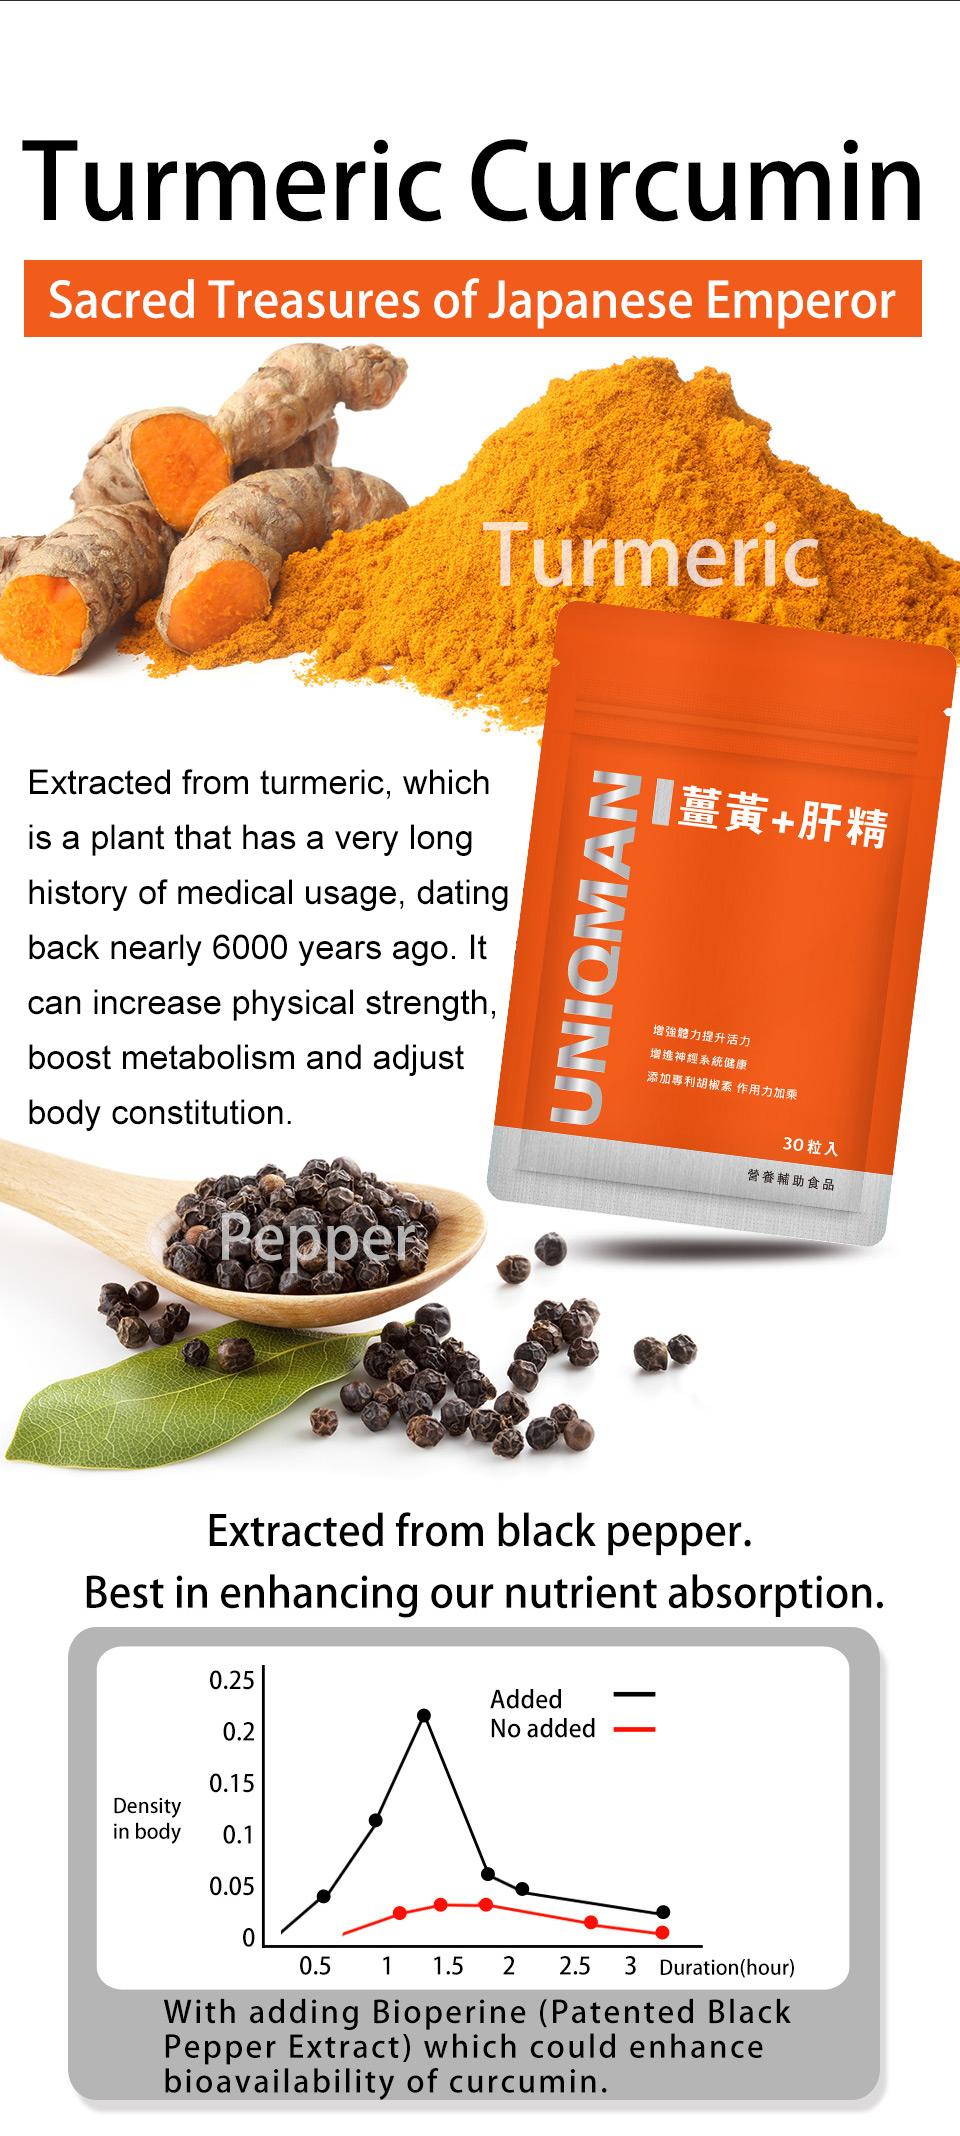 UNIQMAN Turmeric Curcumin contains piperine to enhance nutrient absorption